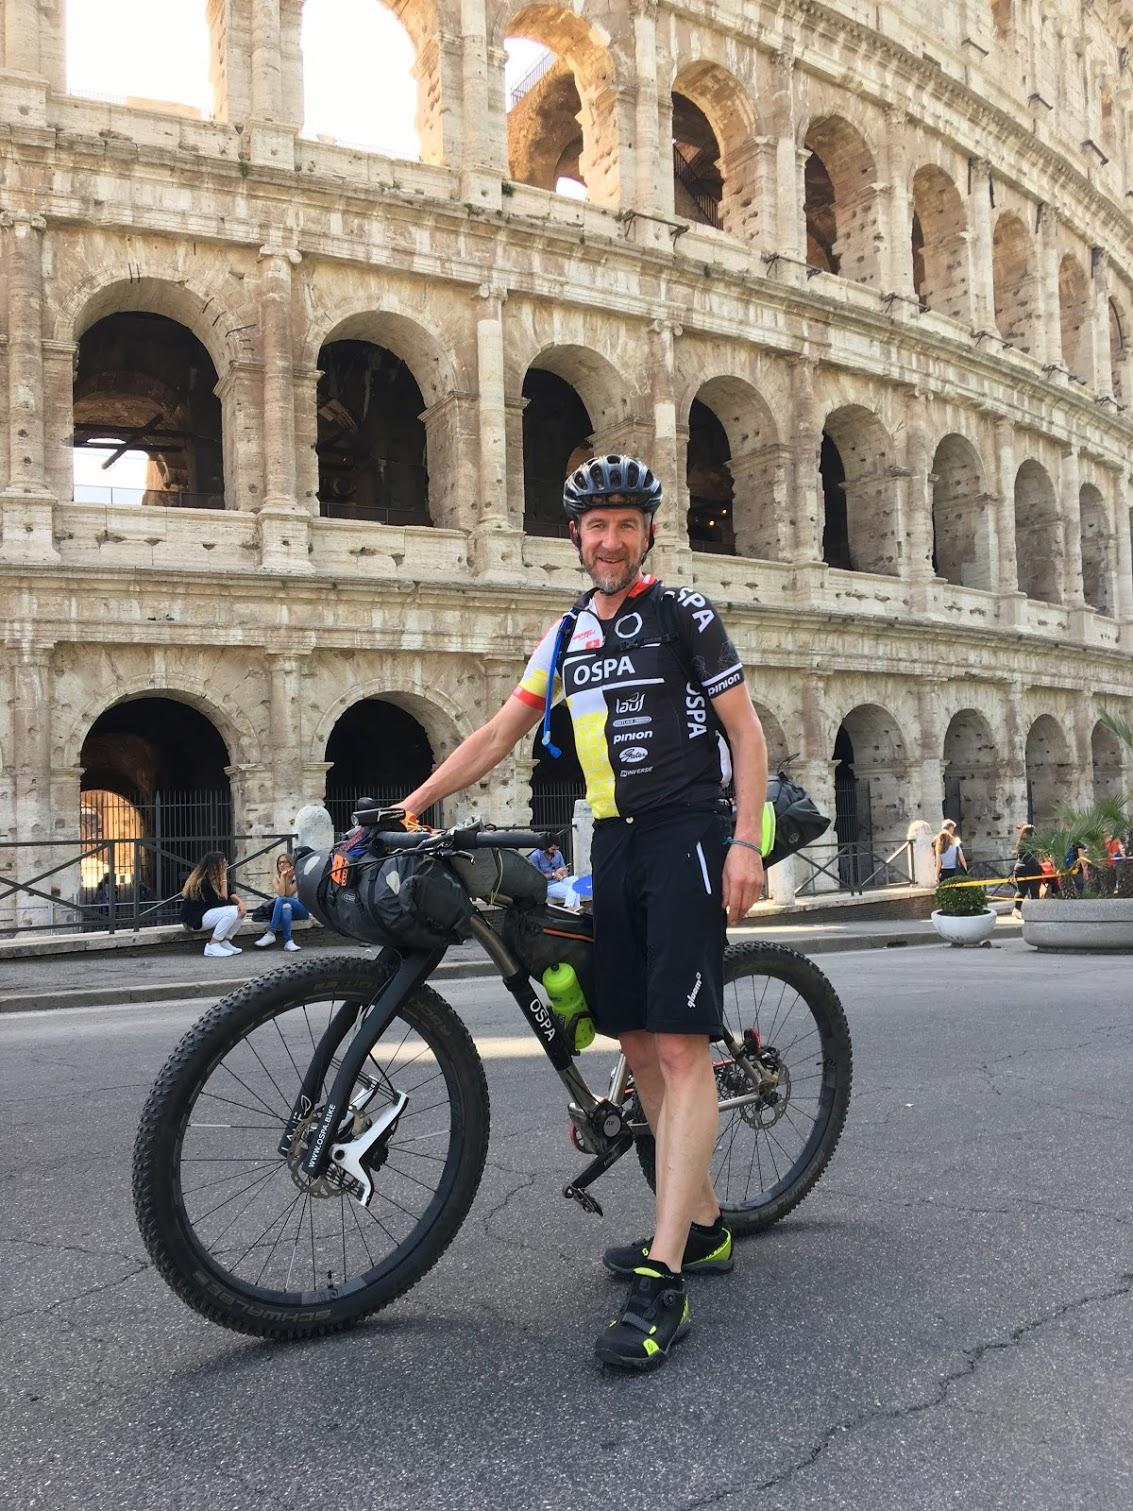 OSPA-DIVIDE 2018-Day1-Rome-Coloseo2.JPG